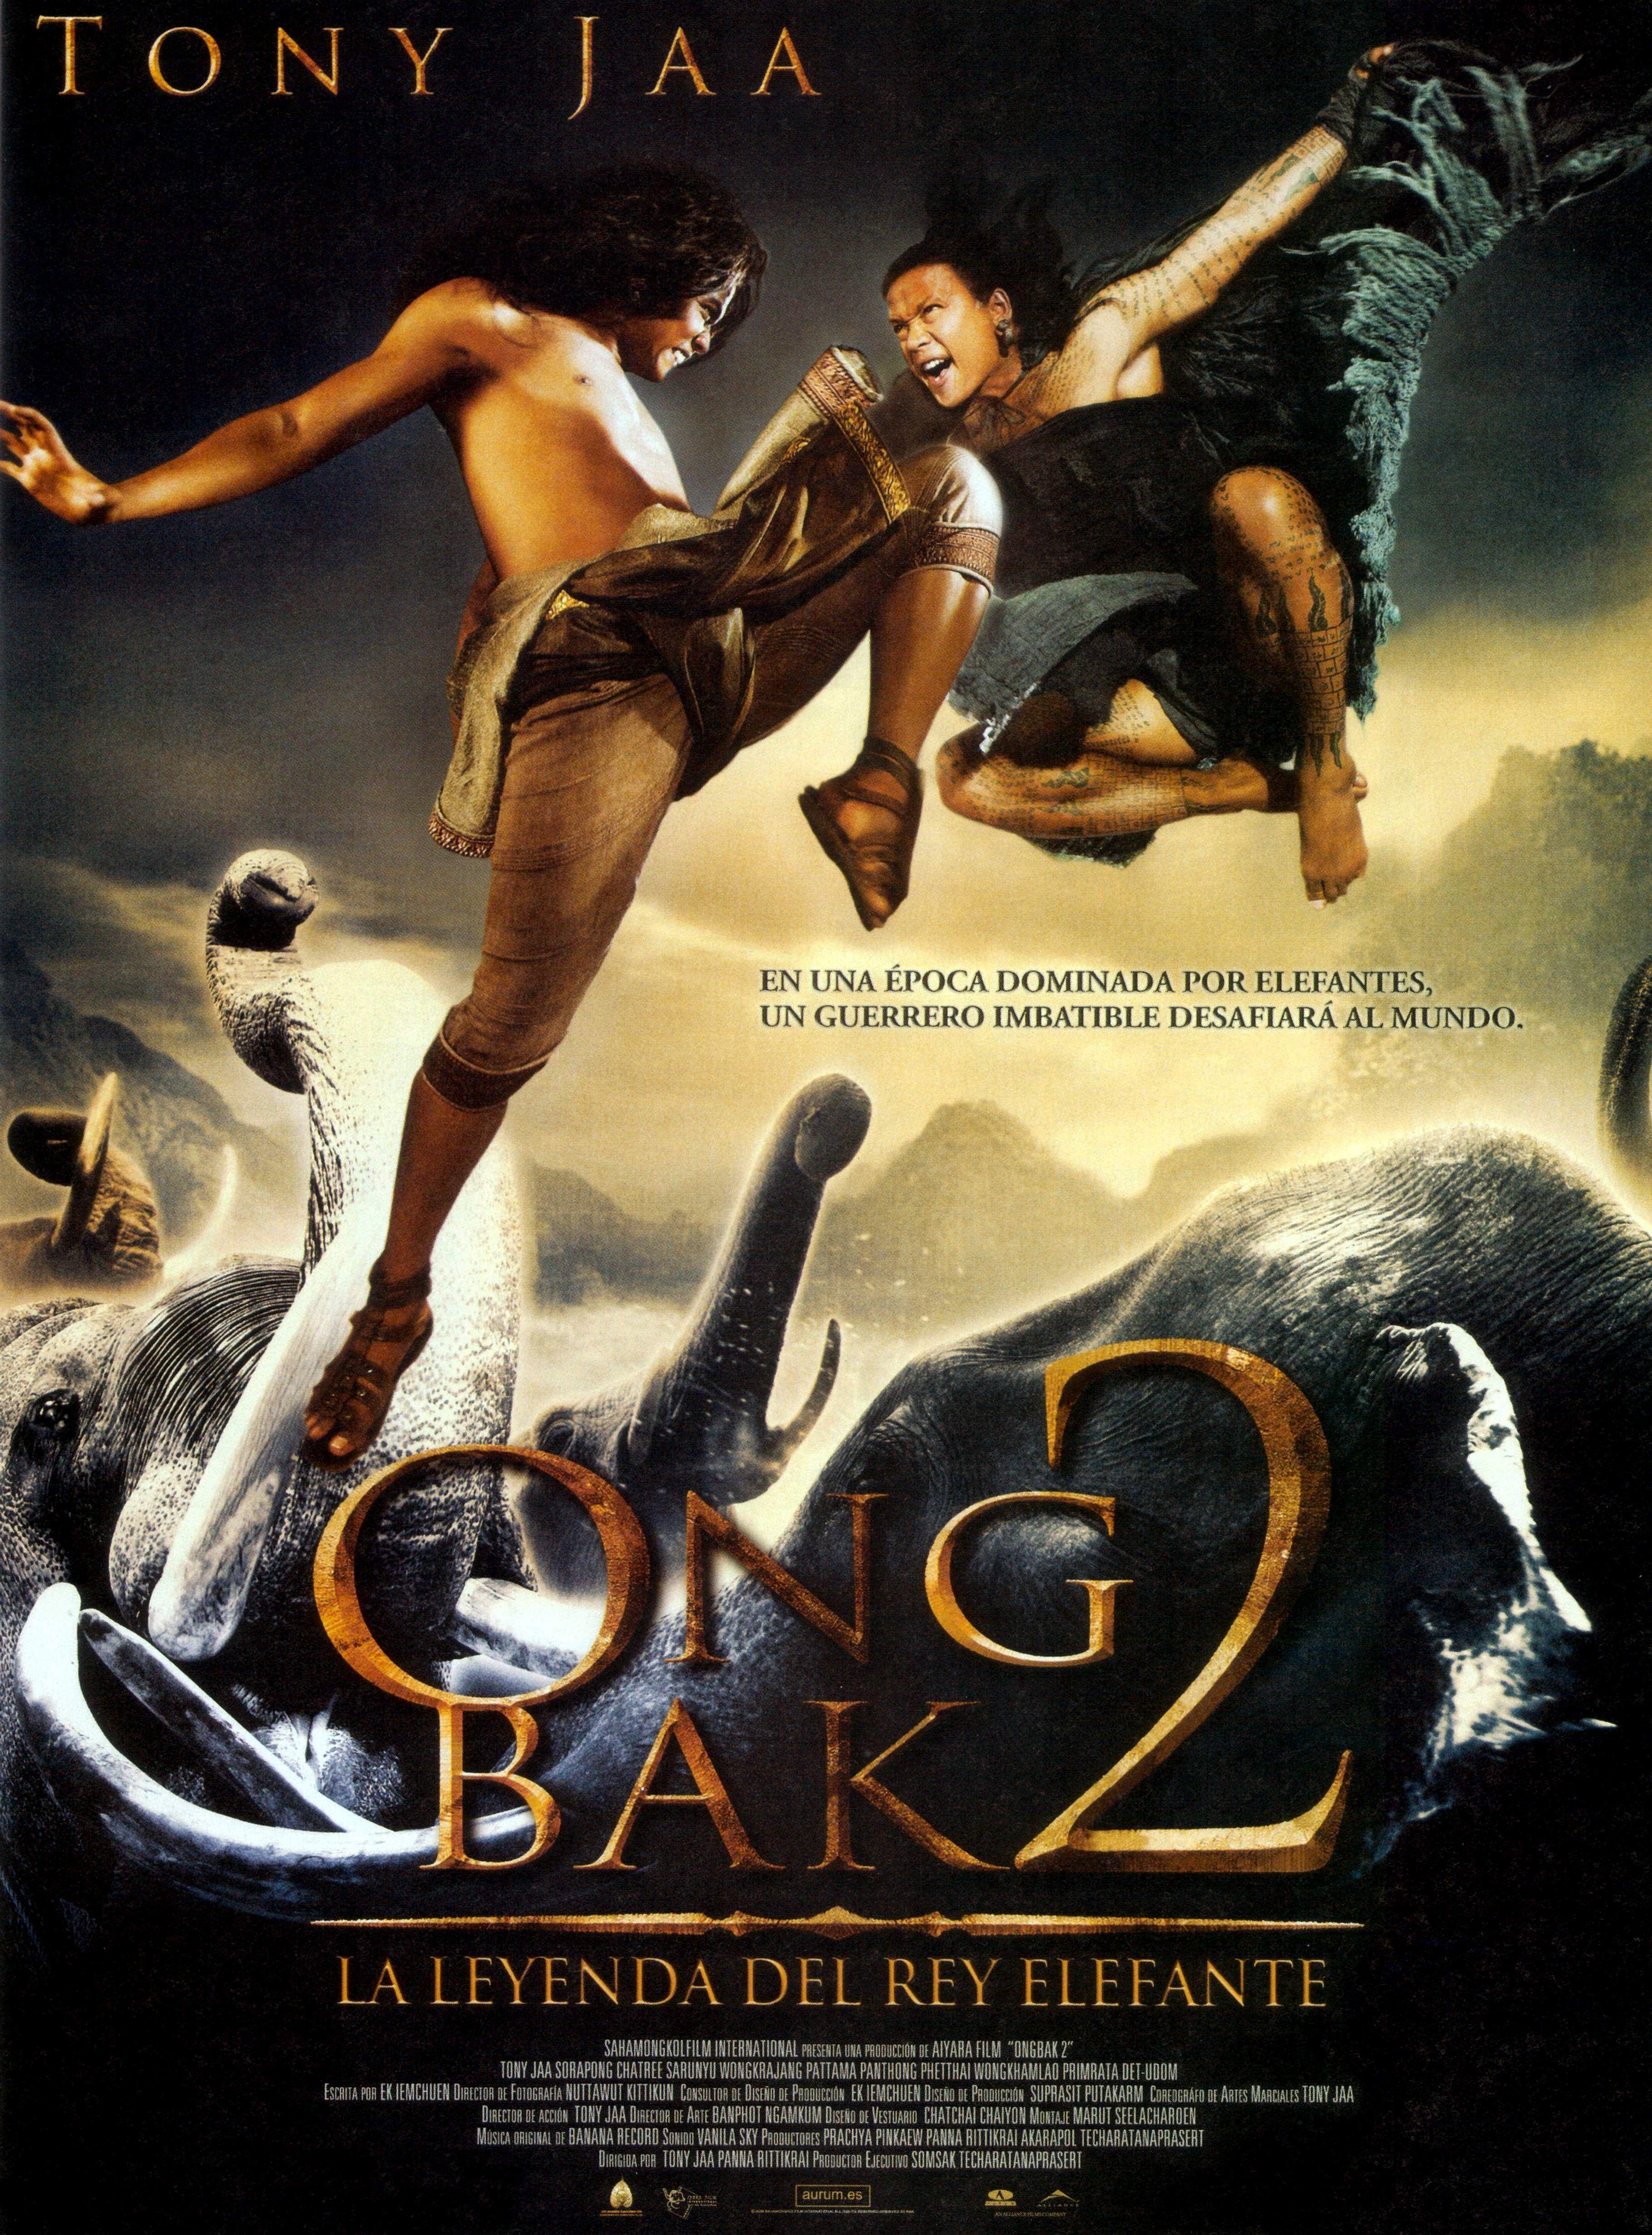 BAIXAR 2 RMVB BAK FILME DUBLADO ONG